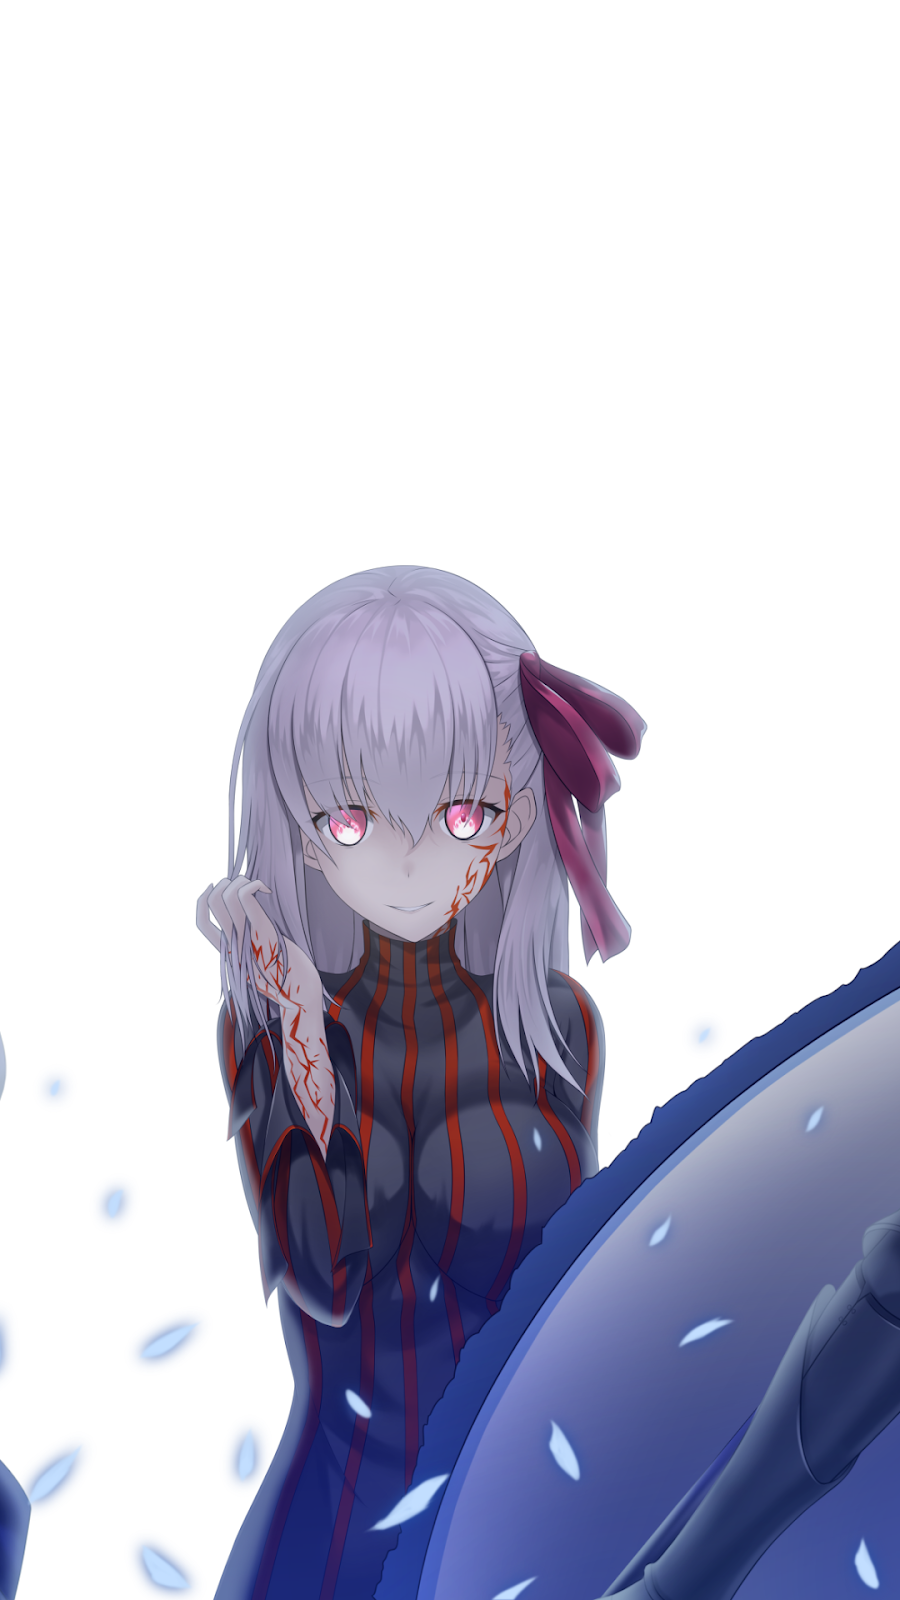 Sakura Matou Handy Tapeten Fate Grand Bestellung Fate Stay Night Sakura Fate Stay Night Anime Fate Anime Series